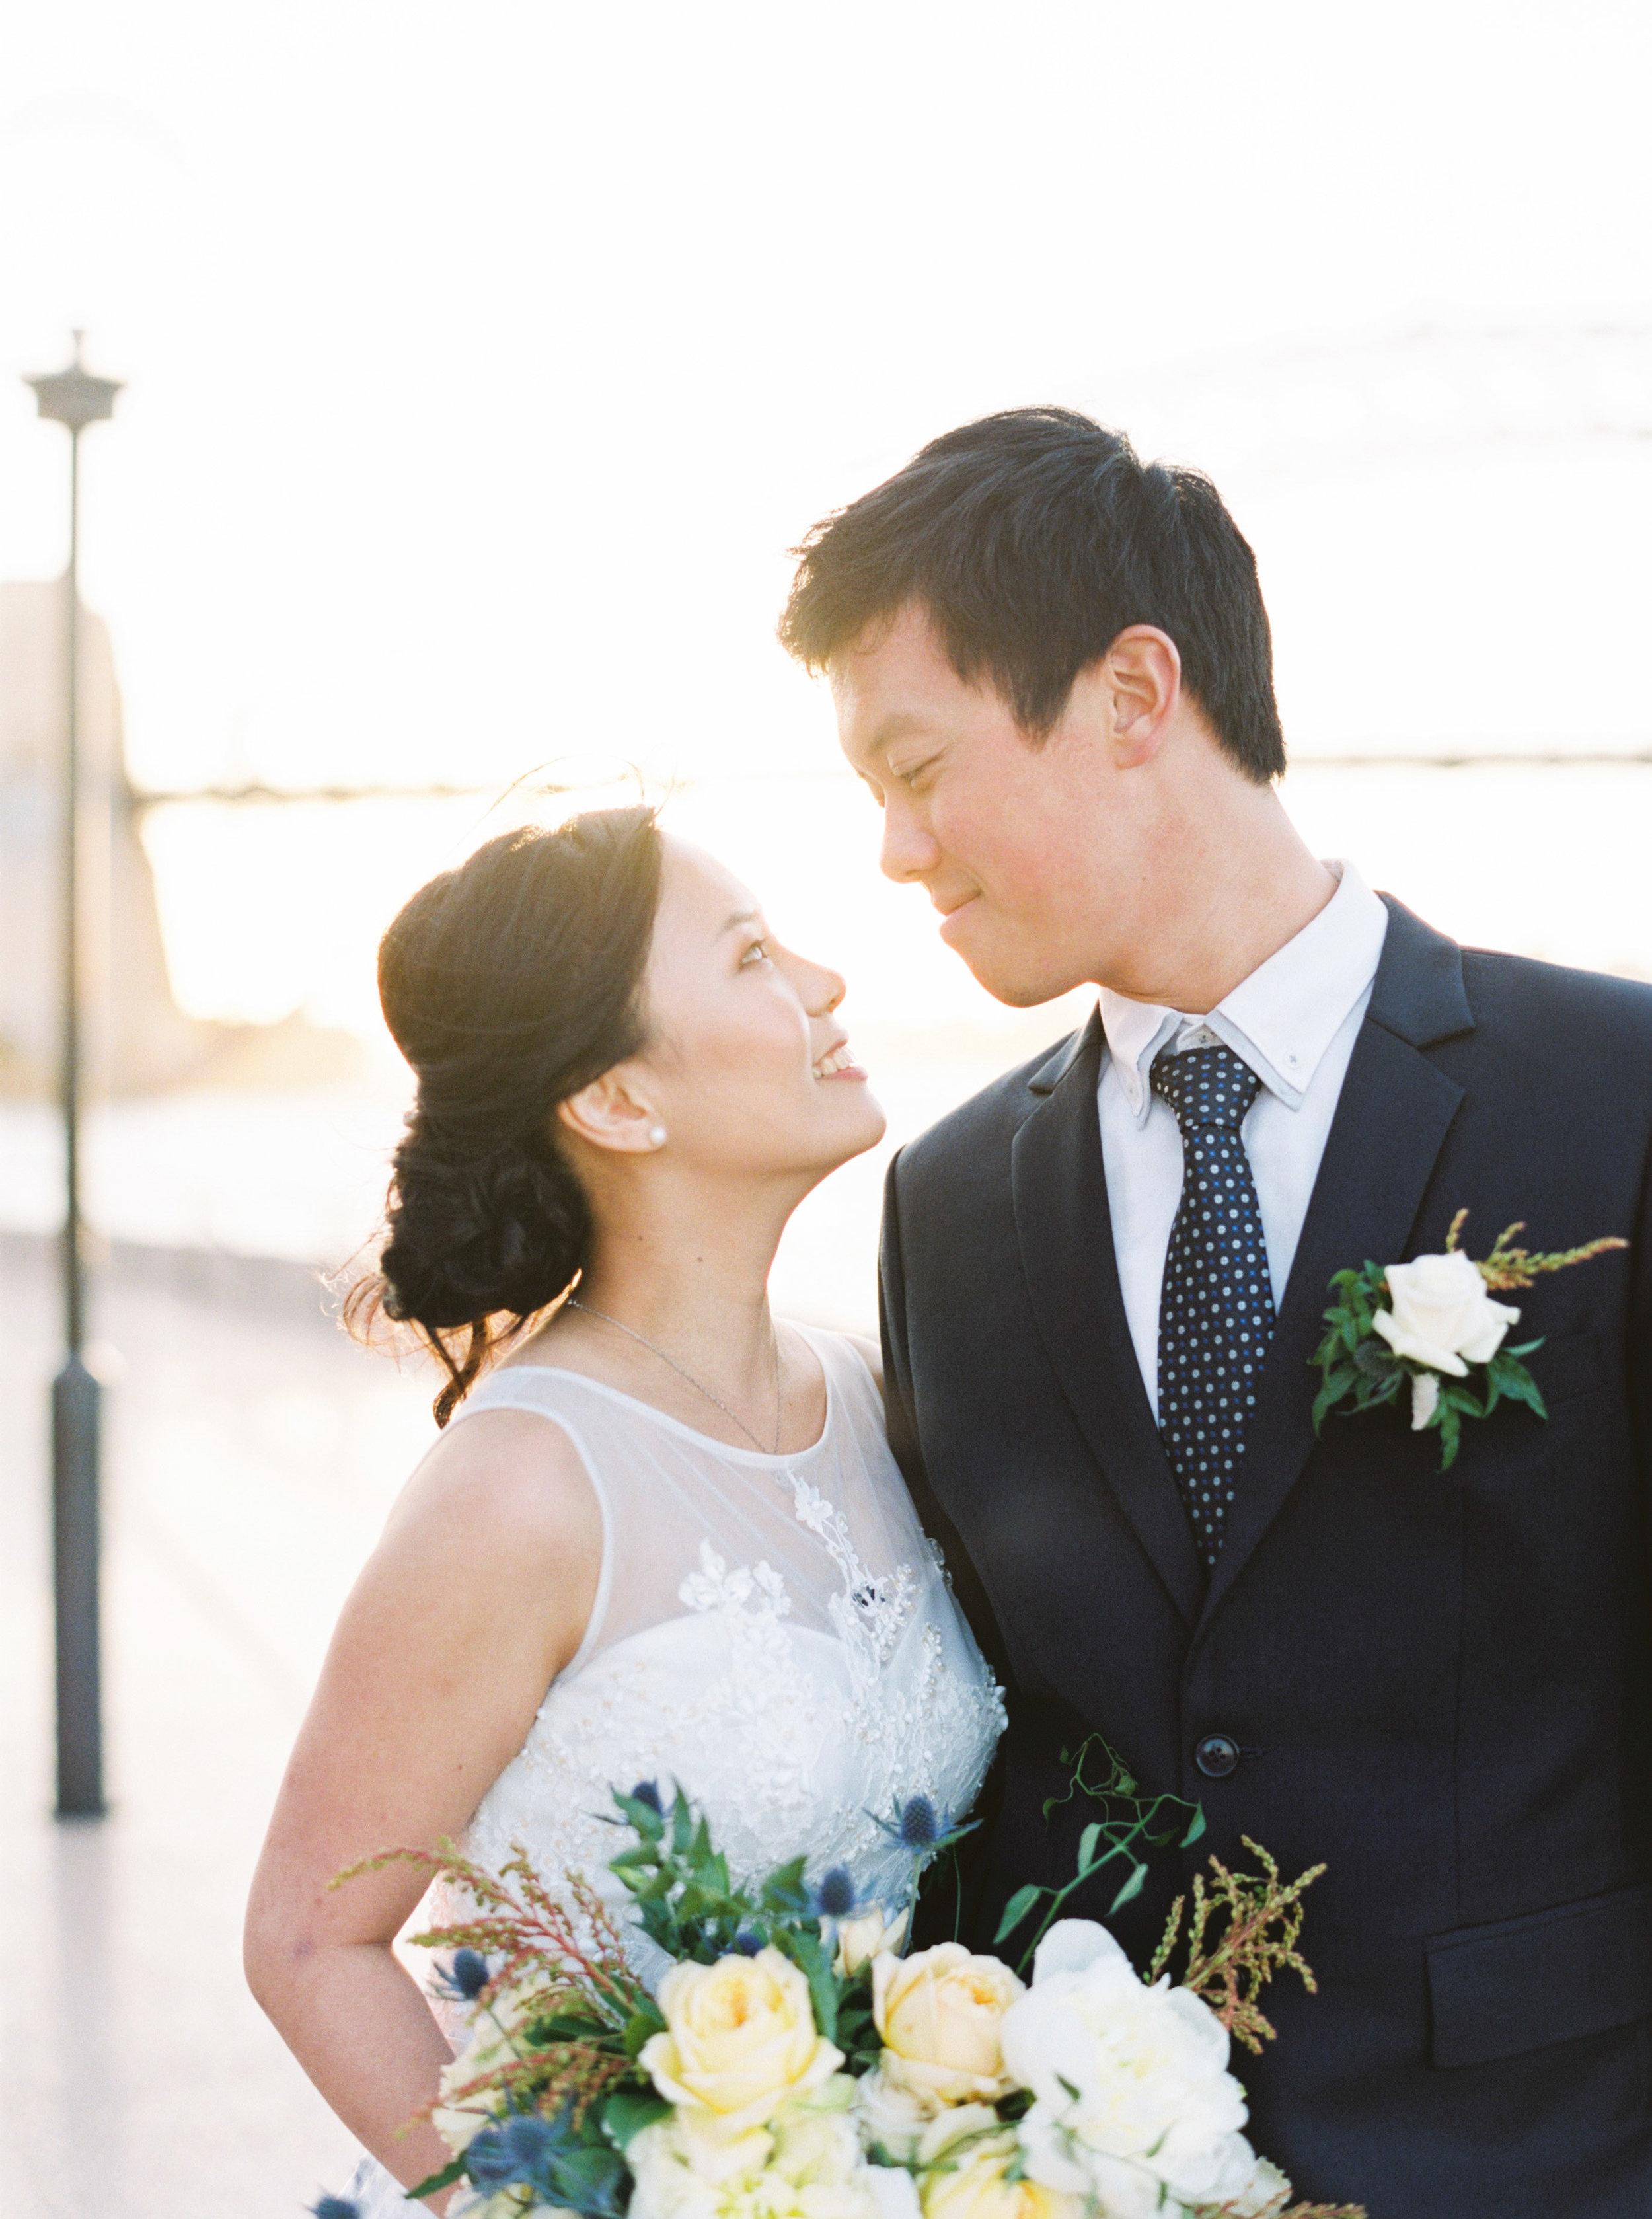 00039- Australia Sydney Wedding Photographer Sheri McMahon.jpg